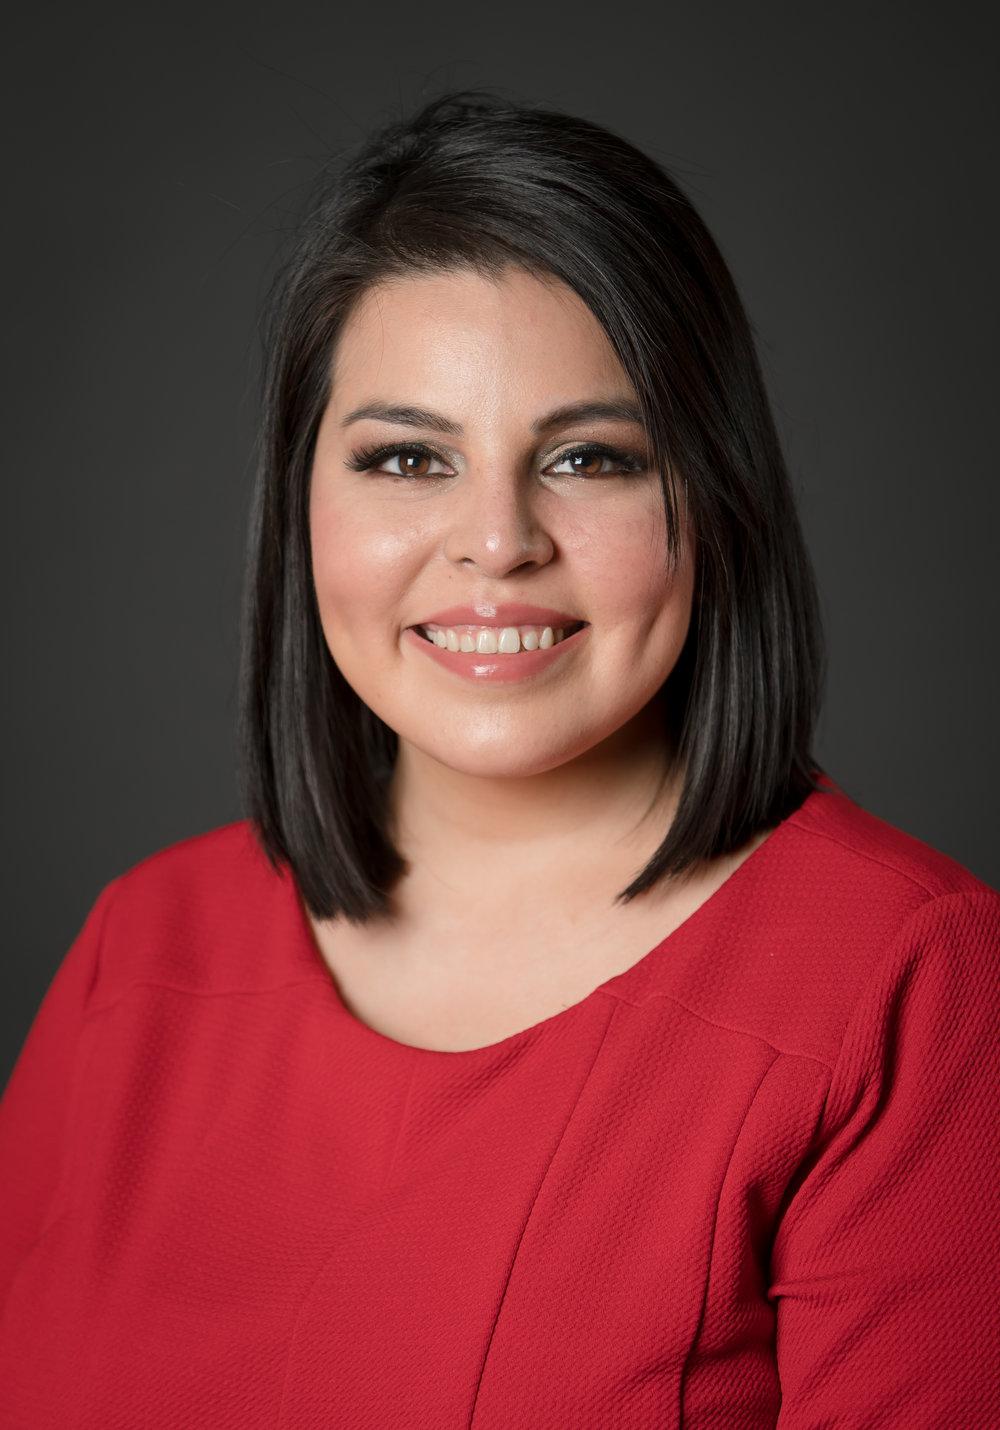 Jacqueline Sandoval